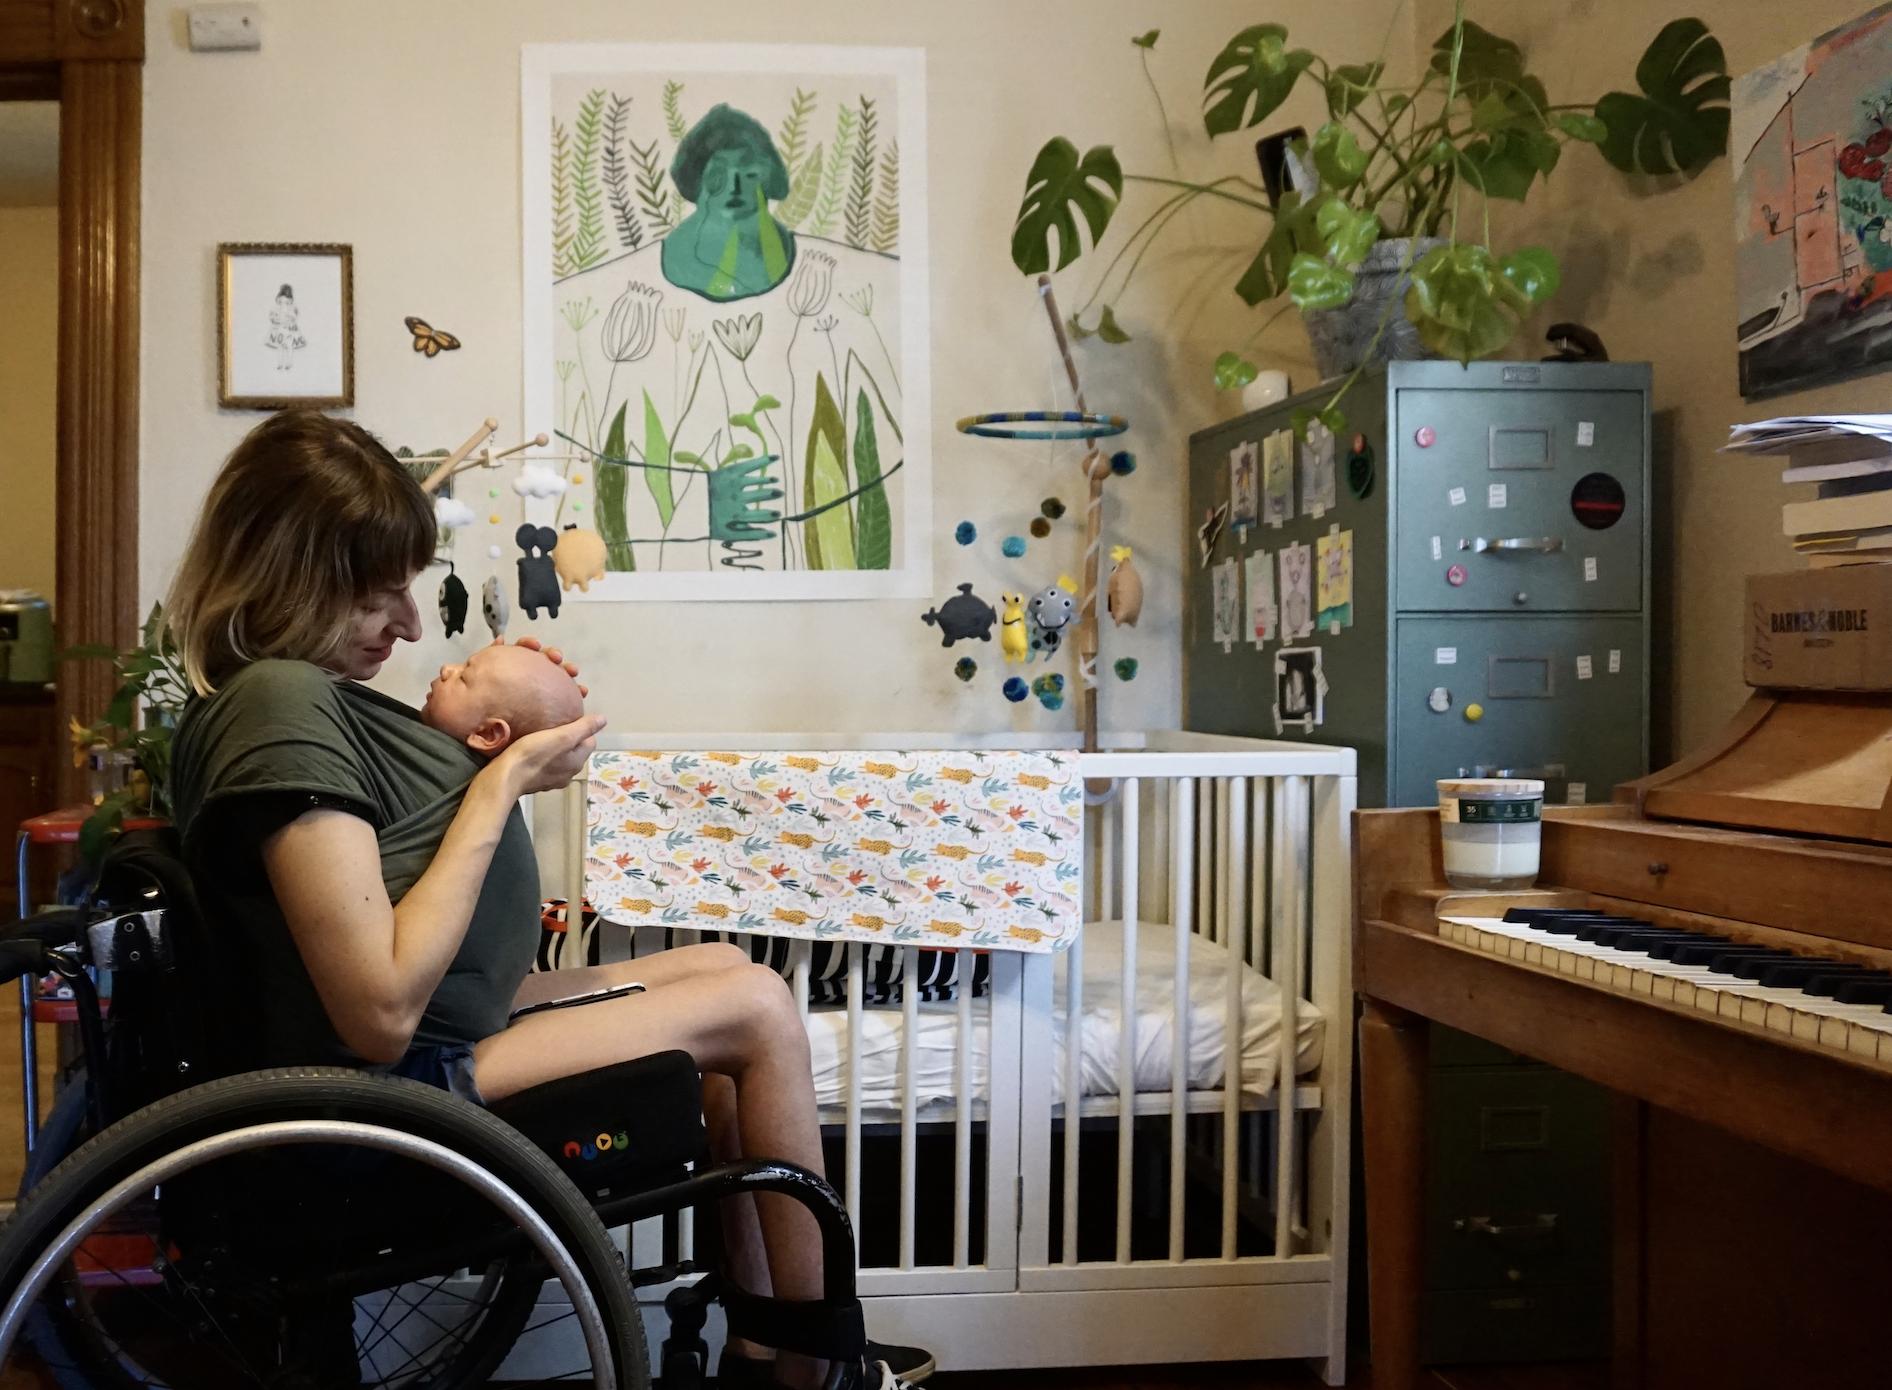 Rebekah Taussig motherhood with a disability